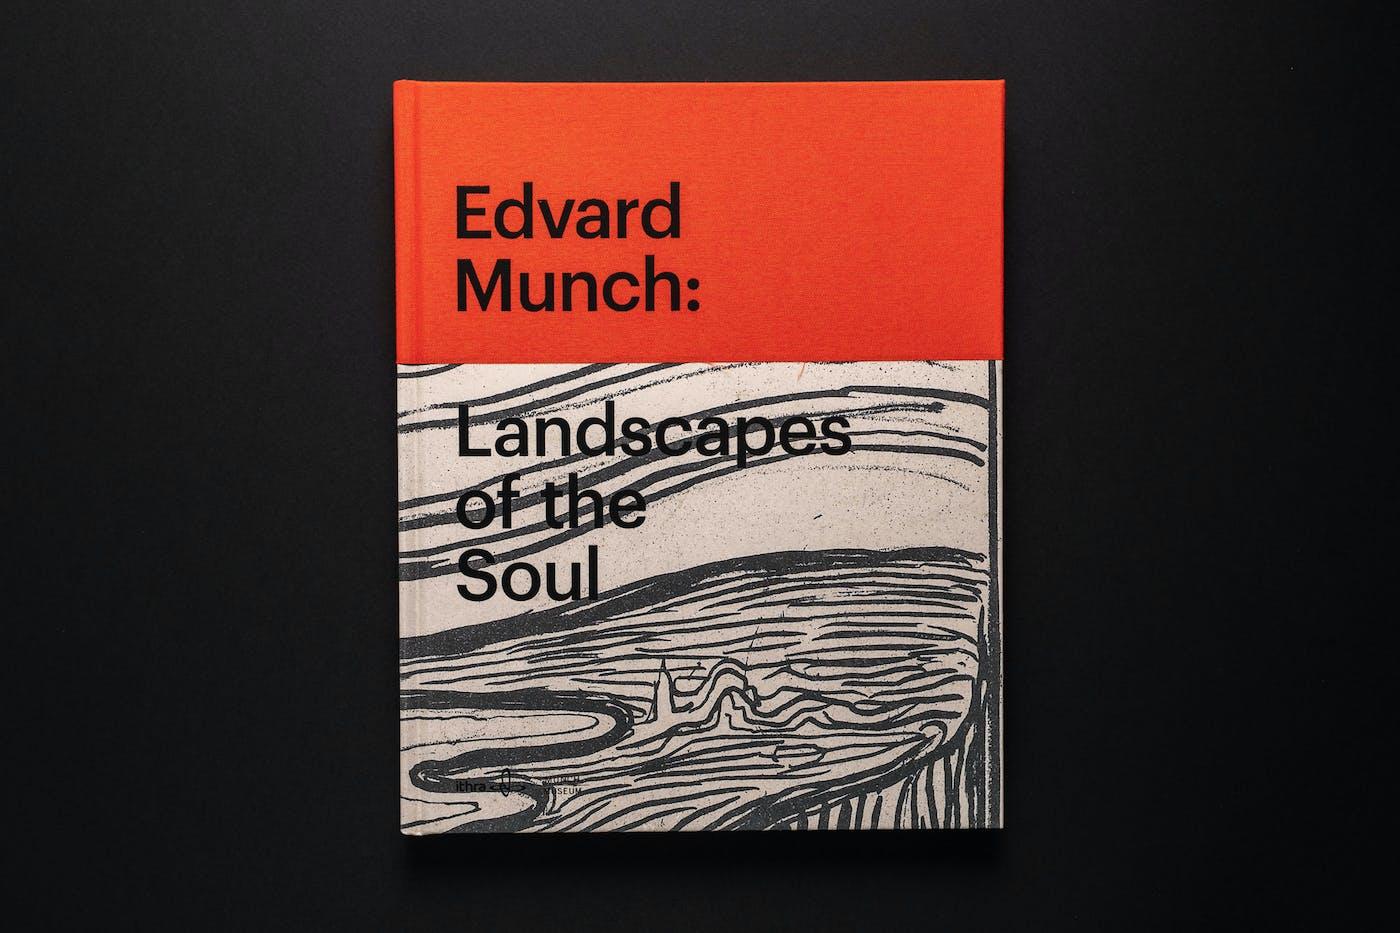 Edvard Munch Landscapes of the soul